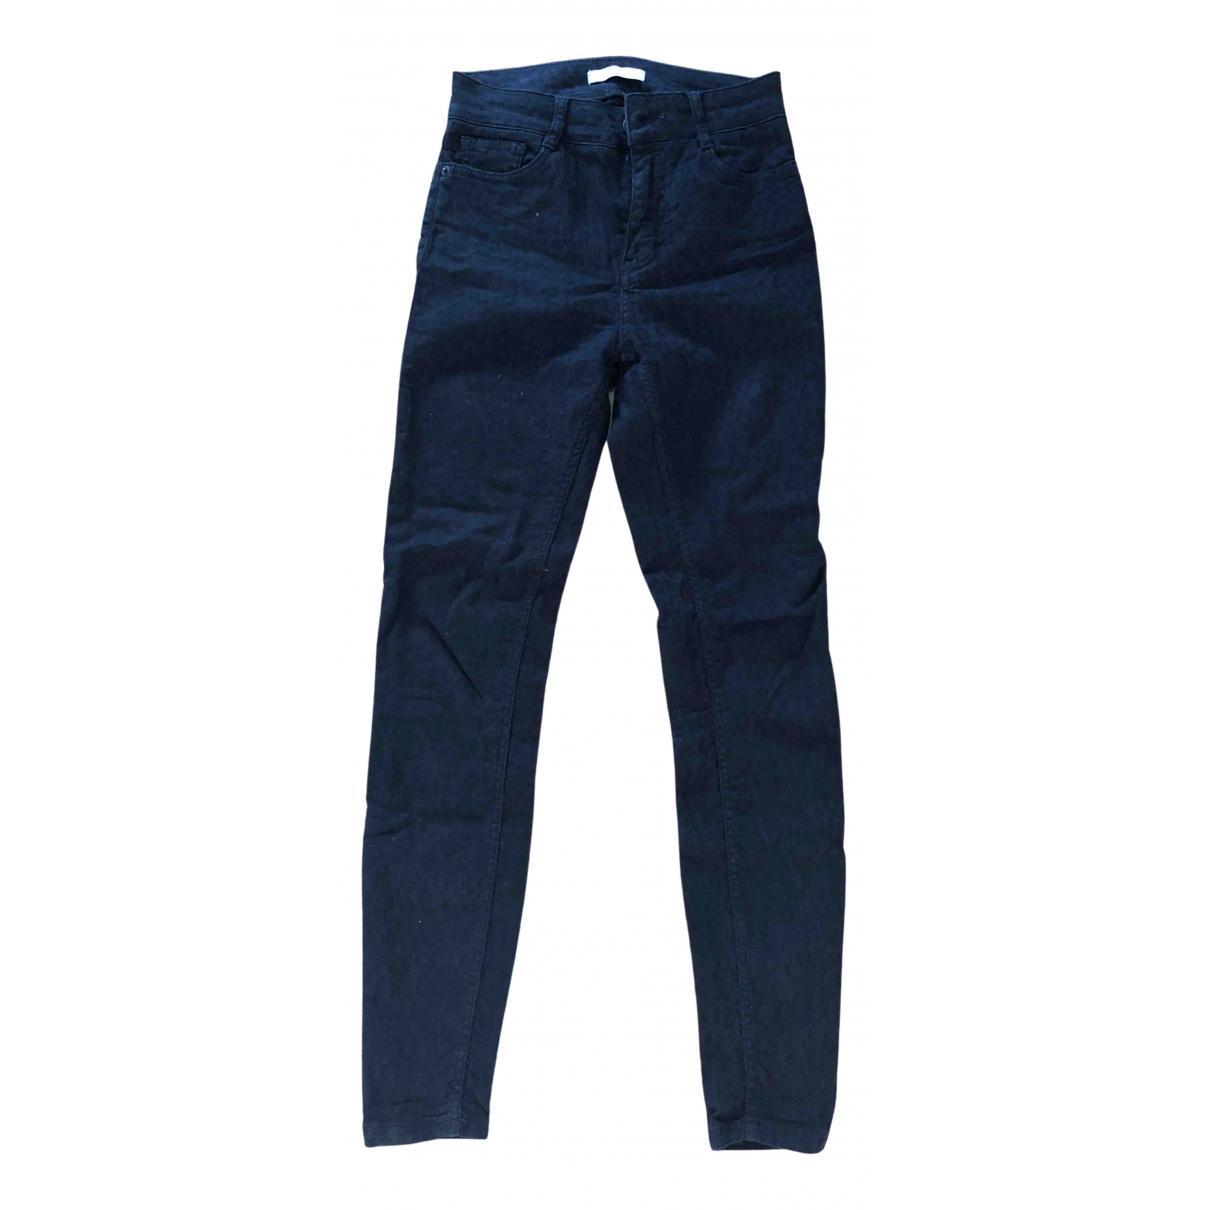 Maje \N Black Cotton - elasthane Jeans for Women 36 FR